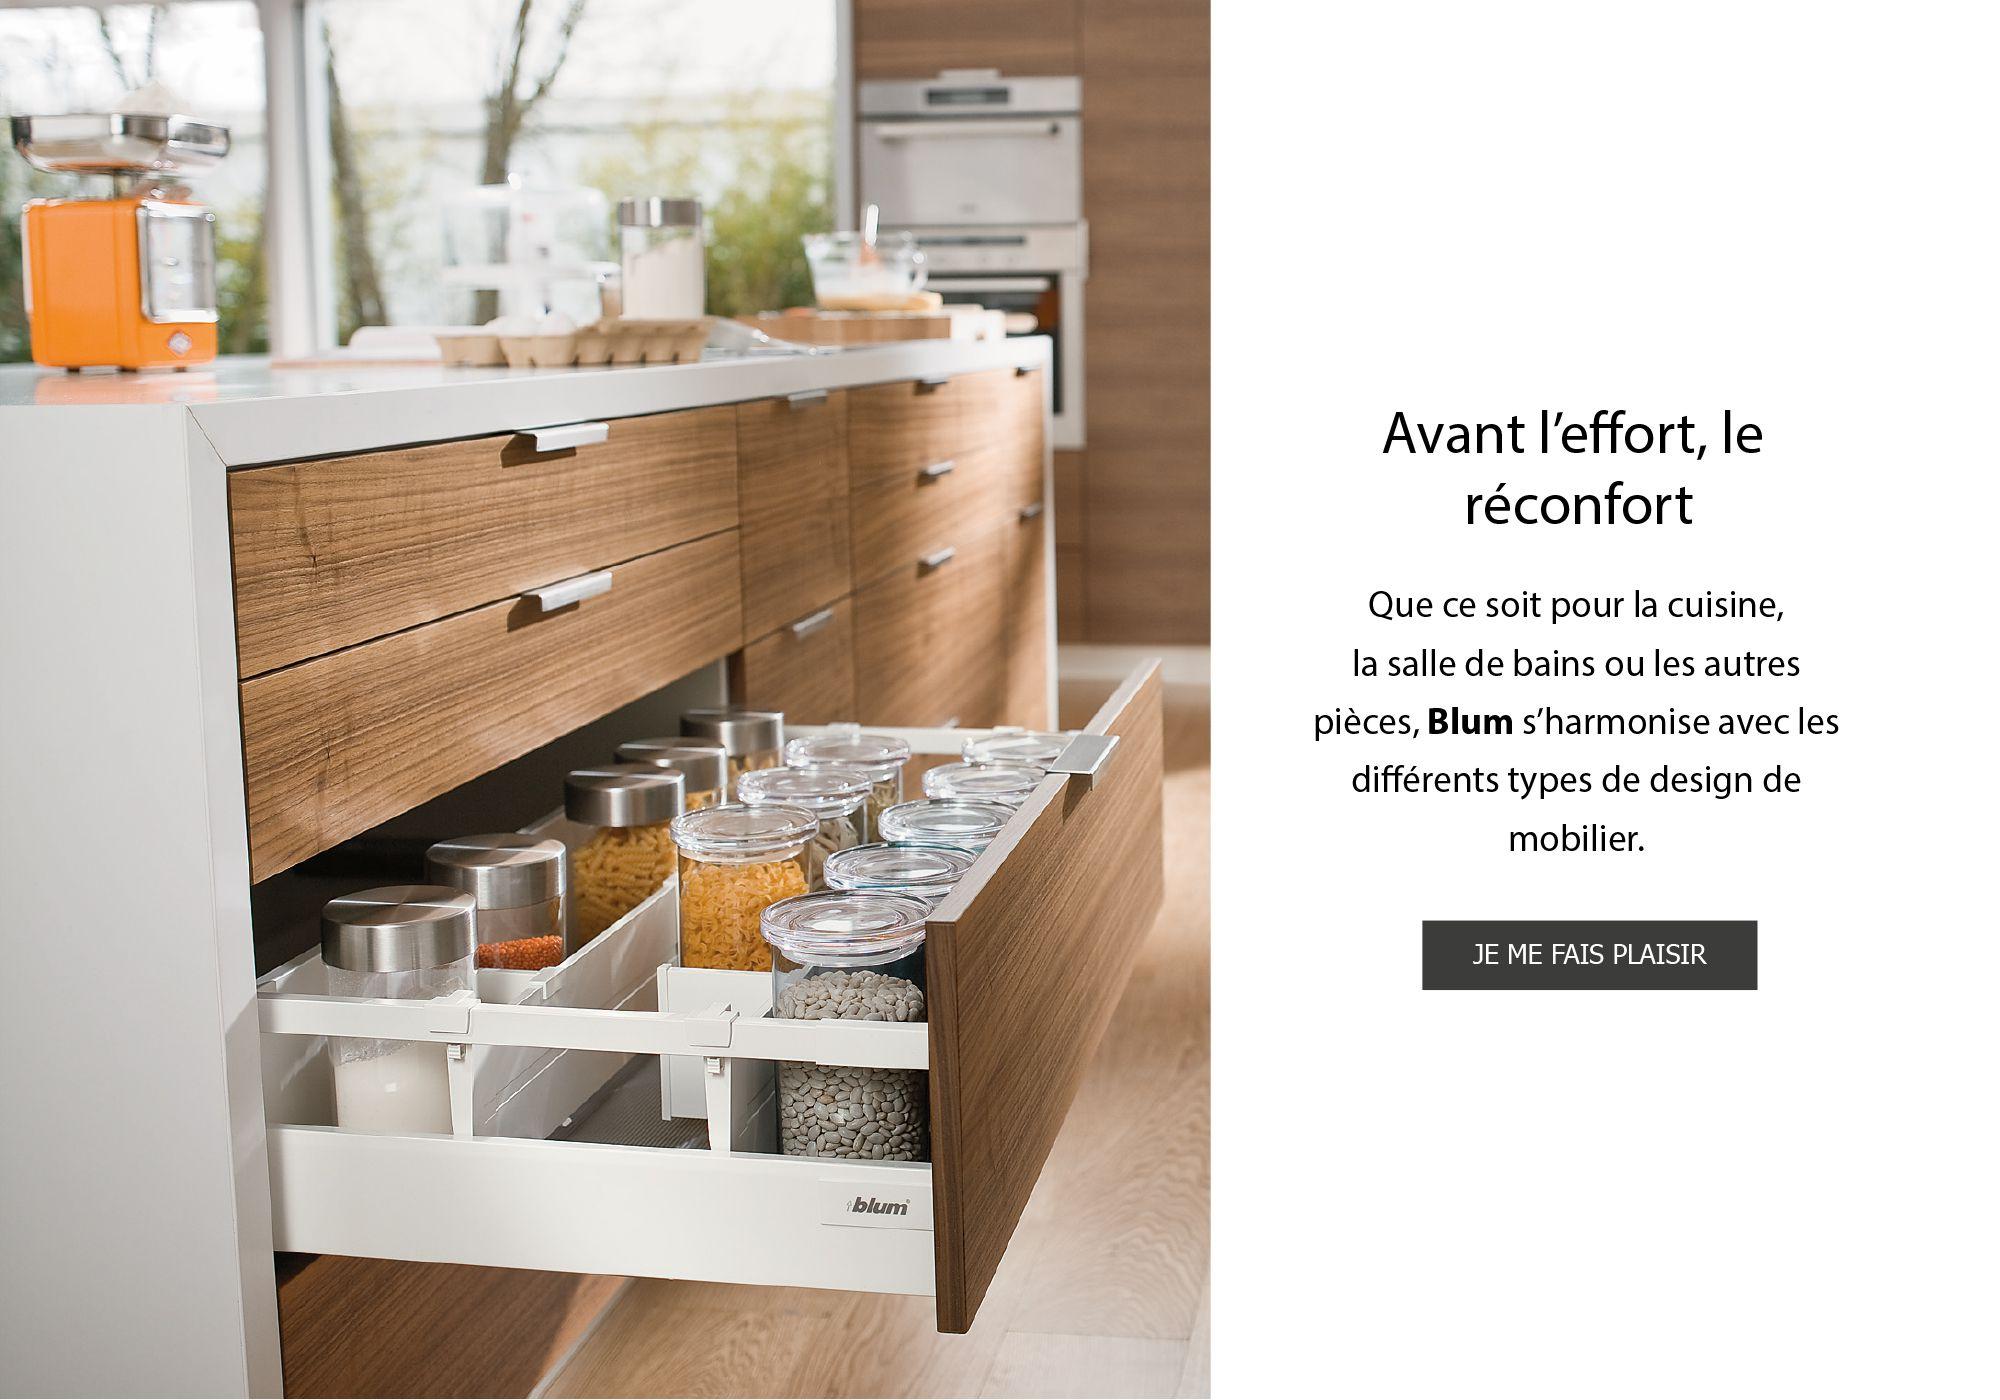 Carrelage Salle De Bain Tilly ~ Promodar Quipements De Cuisine Tunisie Salles De Bains